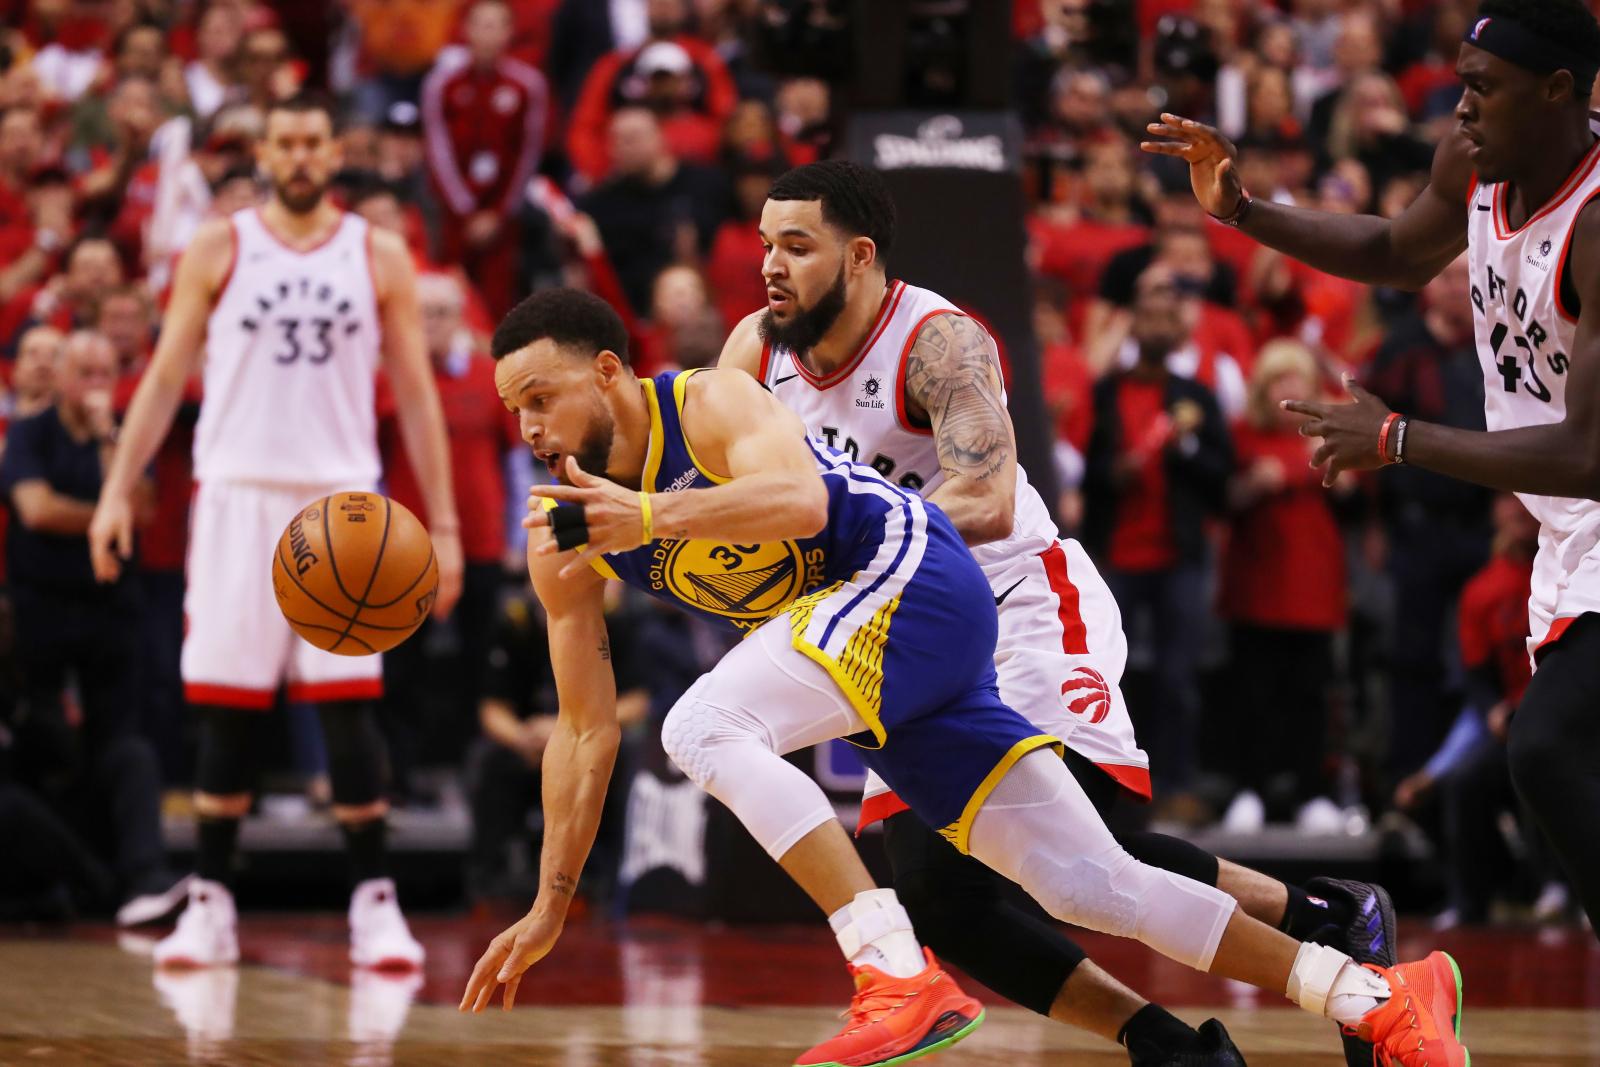 NBA Finals: Toronto Raptors vs. Golden State Warriors game 3 live stream, TV channel, live score and odds